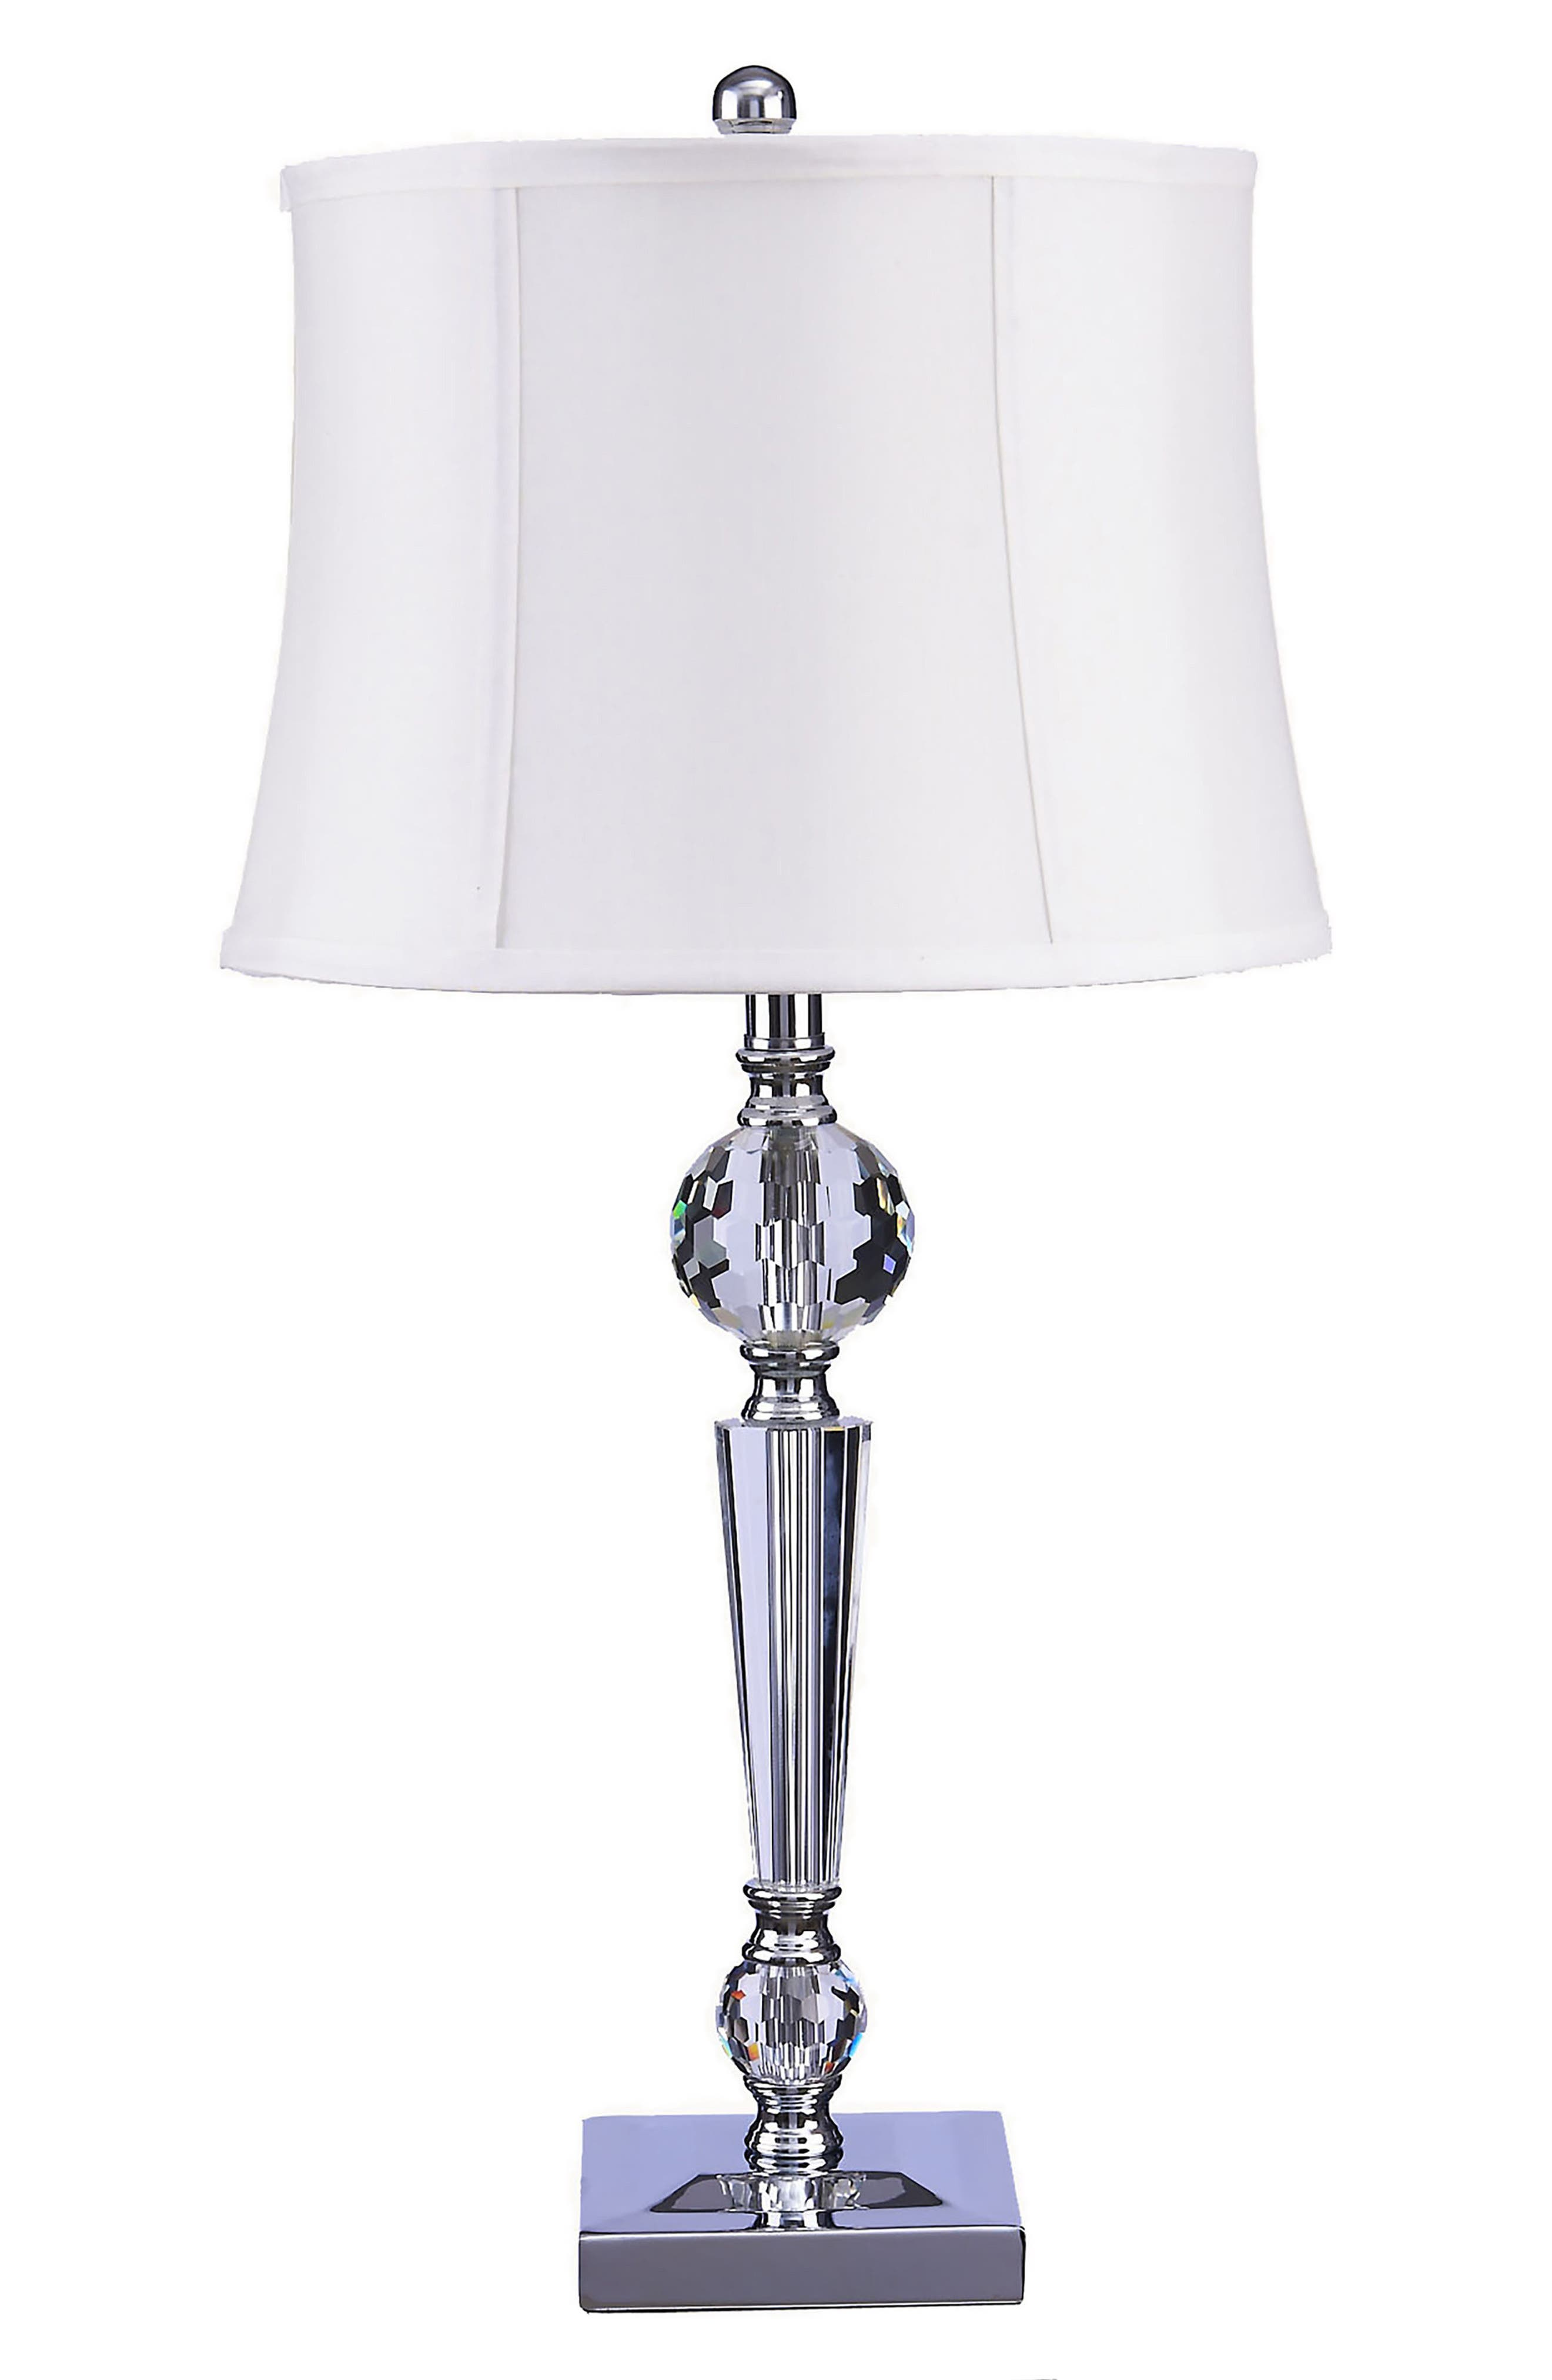 Main Image - JAlexander Camile Table Lamp